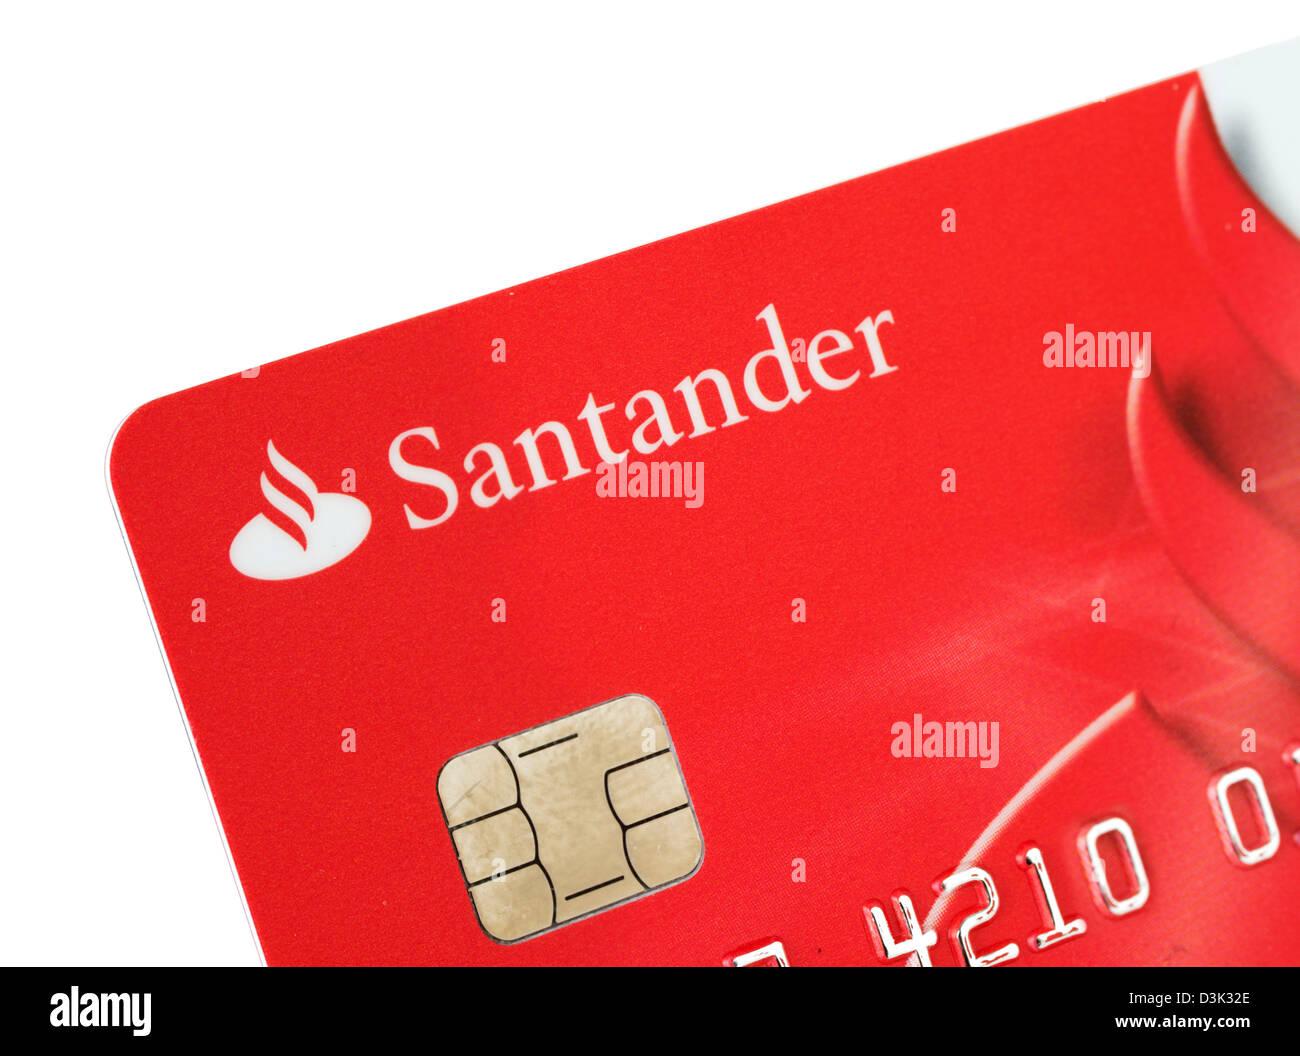 Santander bank visa debit card issued in the uk stock - Be up santander ...